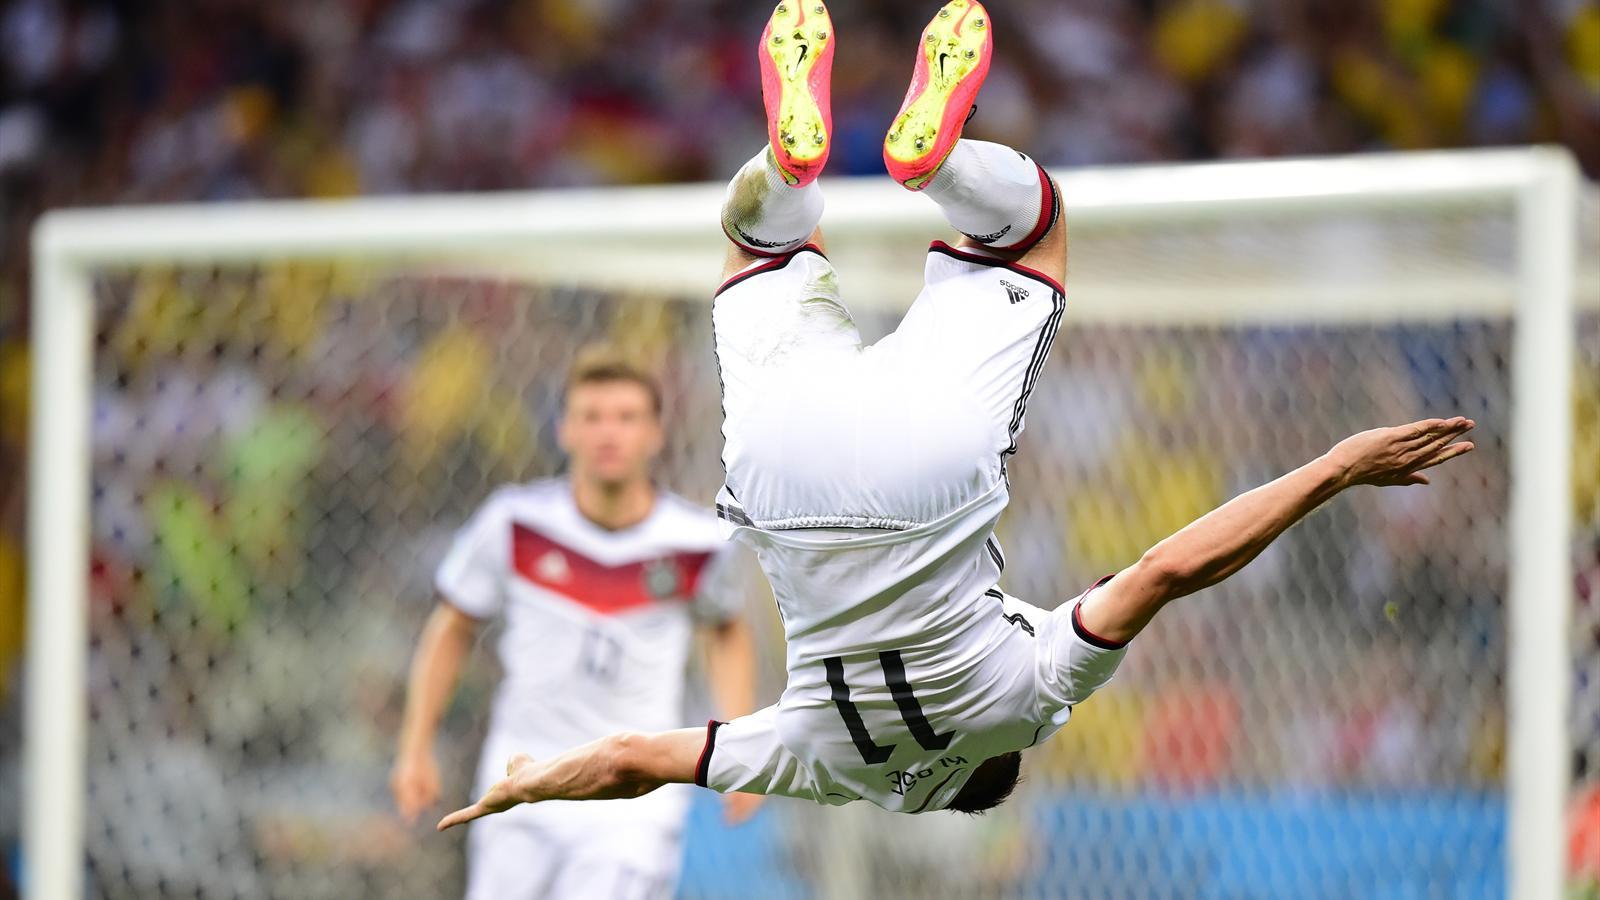 Miroslav Klose et son célèbre salto